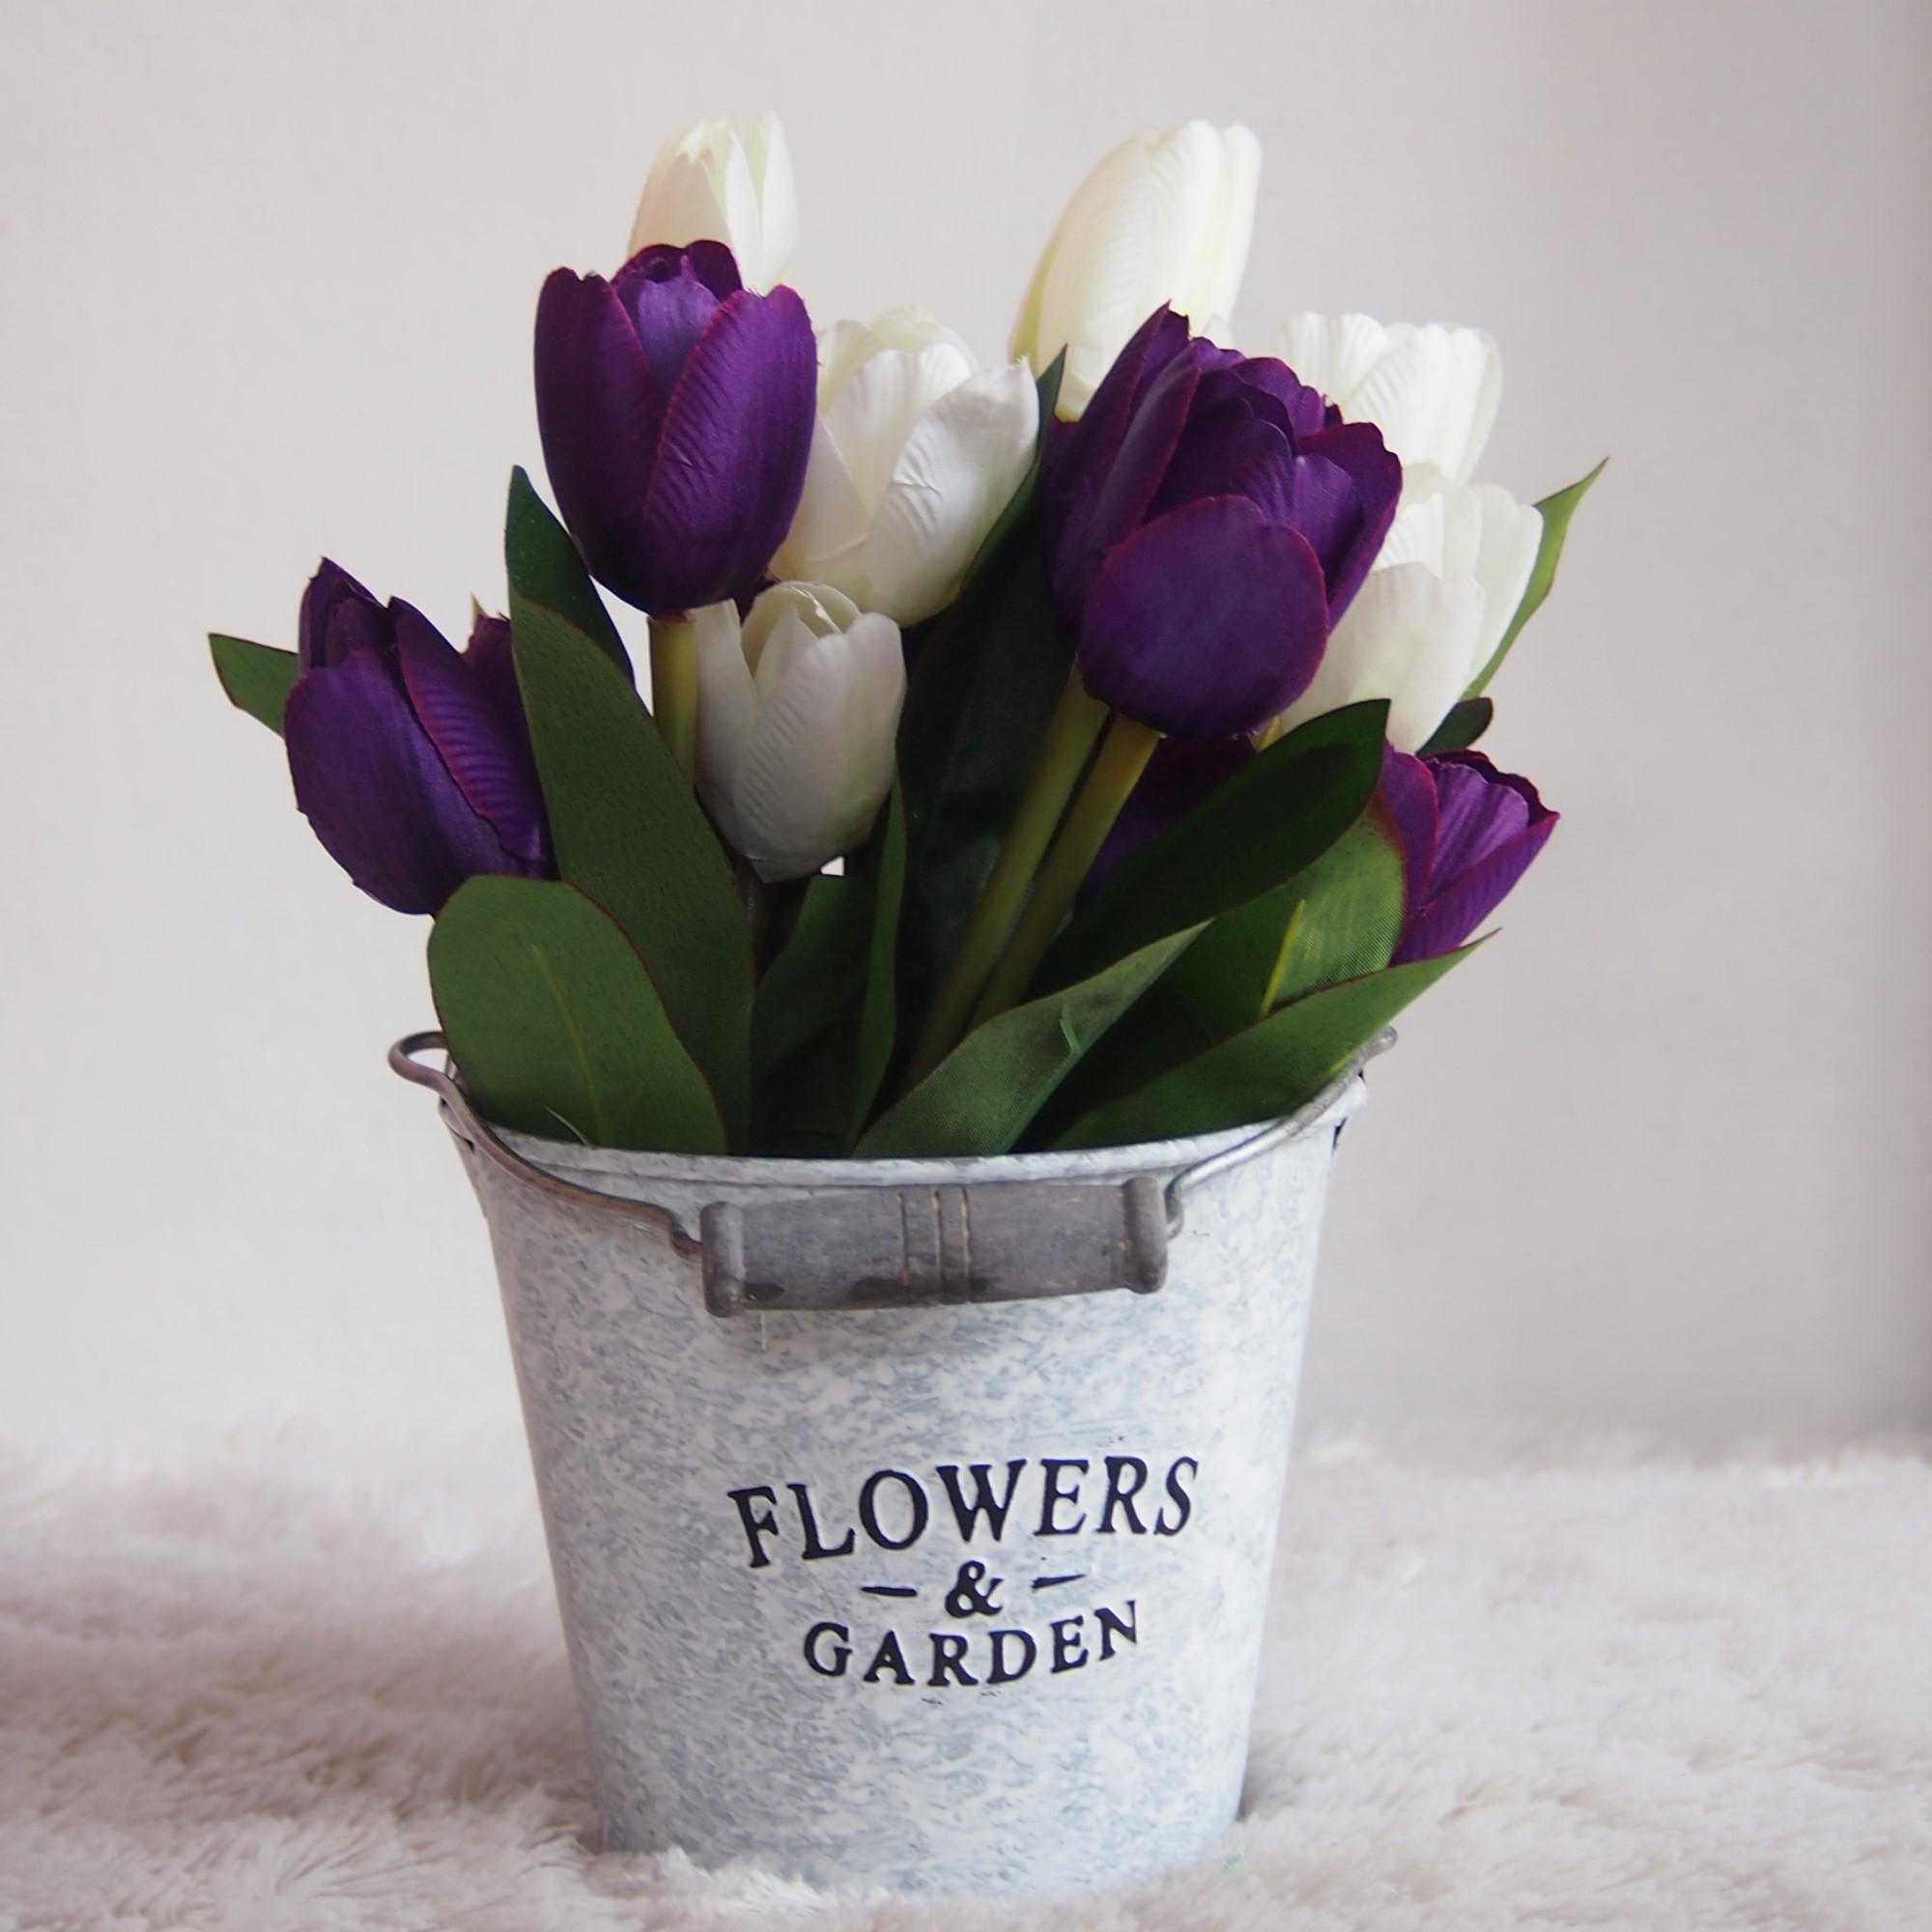 Bunga Hias Plastik - Tanaman artifisial Pot Bulat EK1AIDR87500. Rp 90.000 . a381bebe77